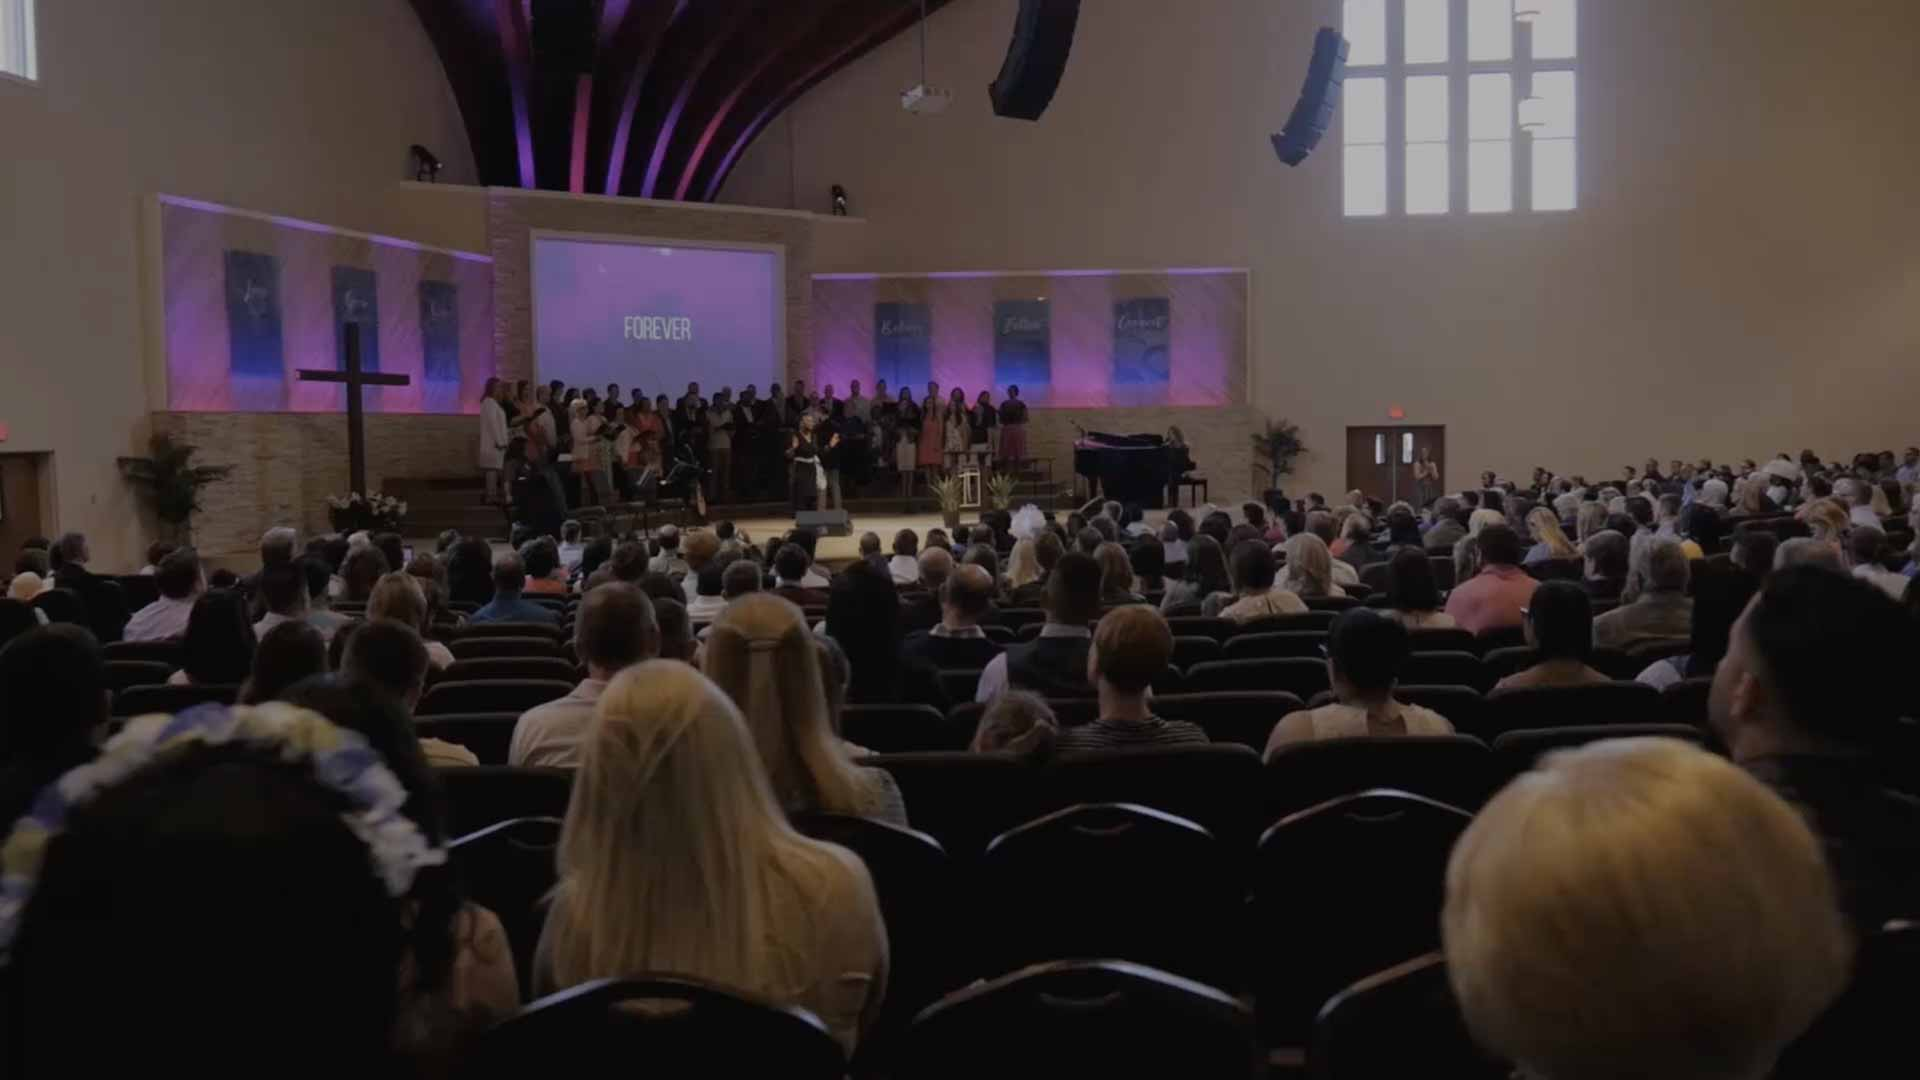 Emmanuel baptist church connecticut